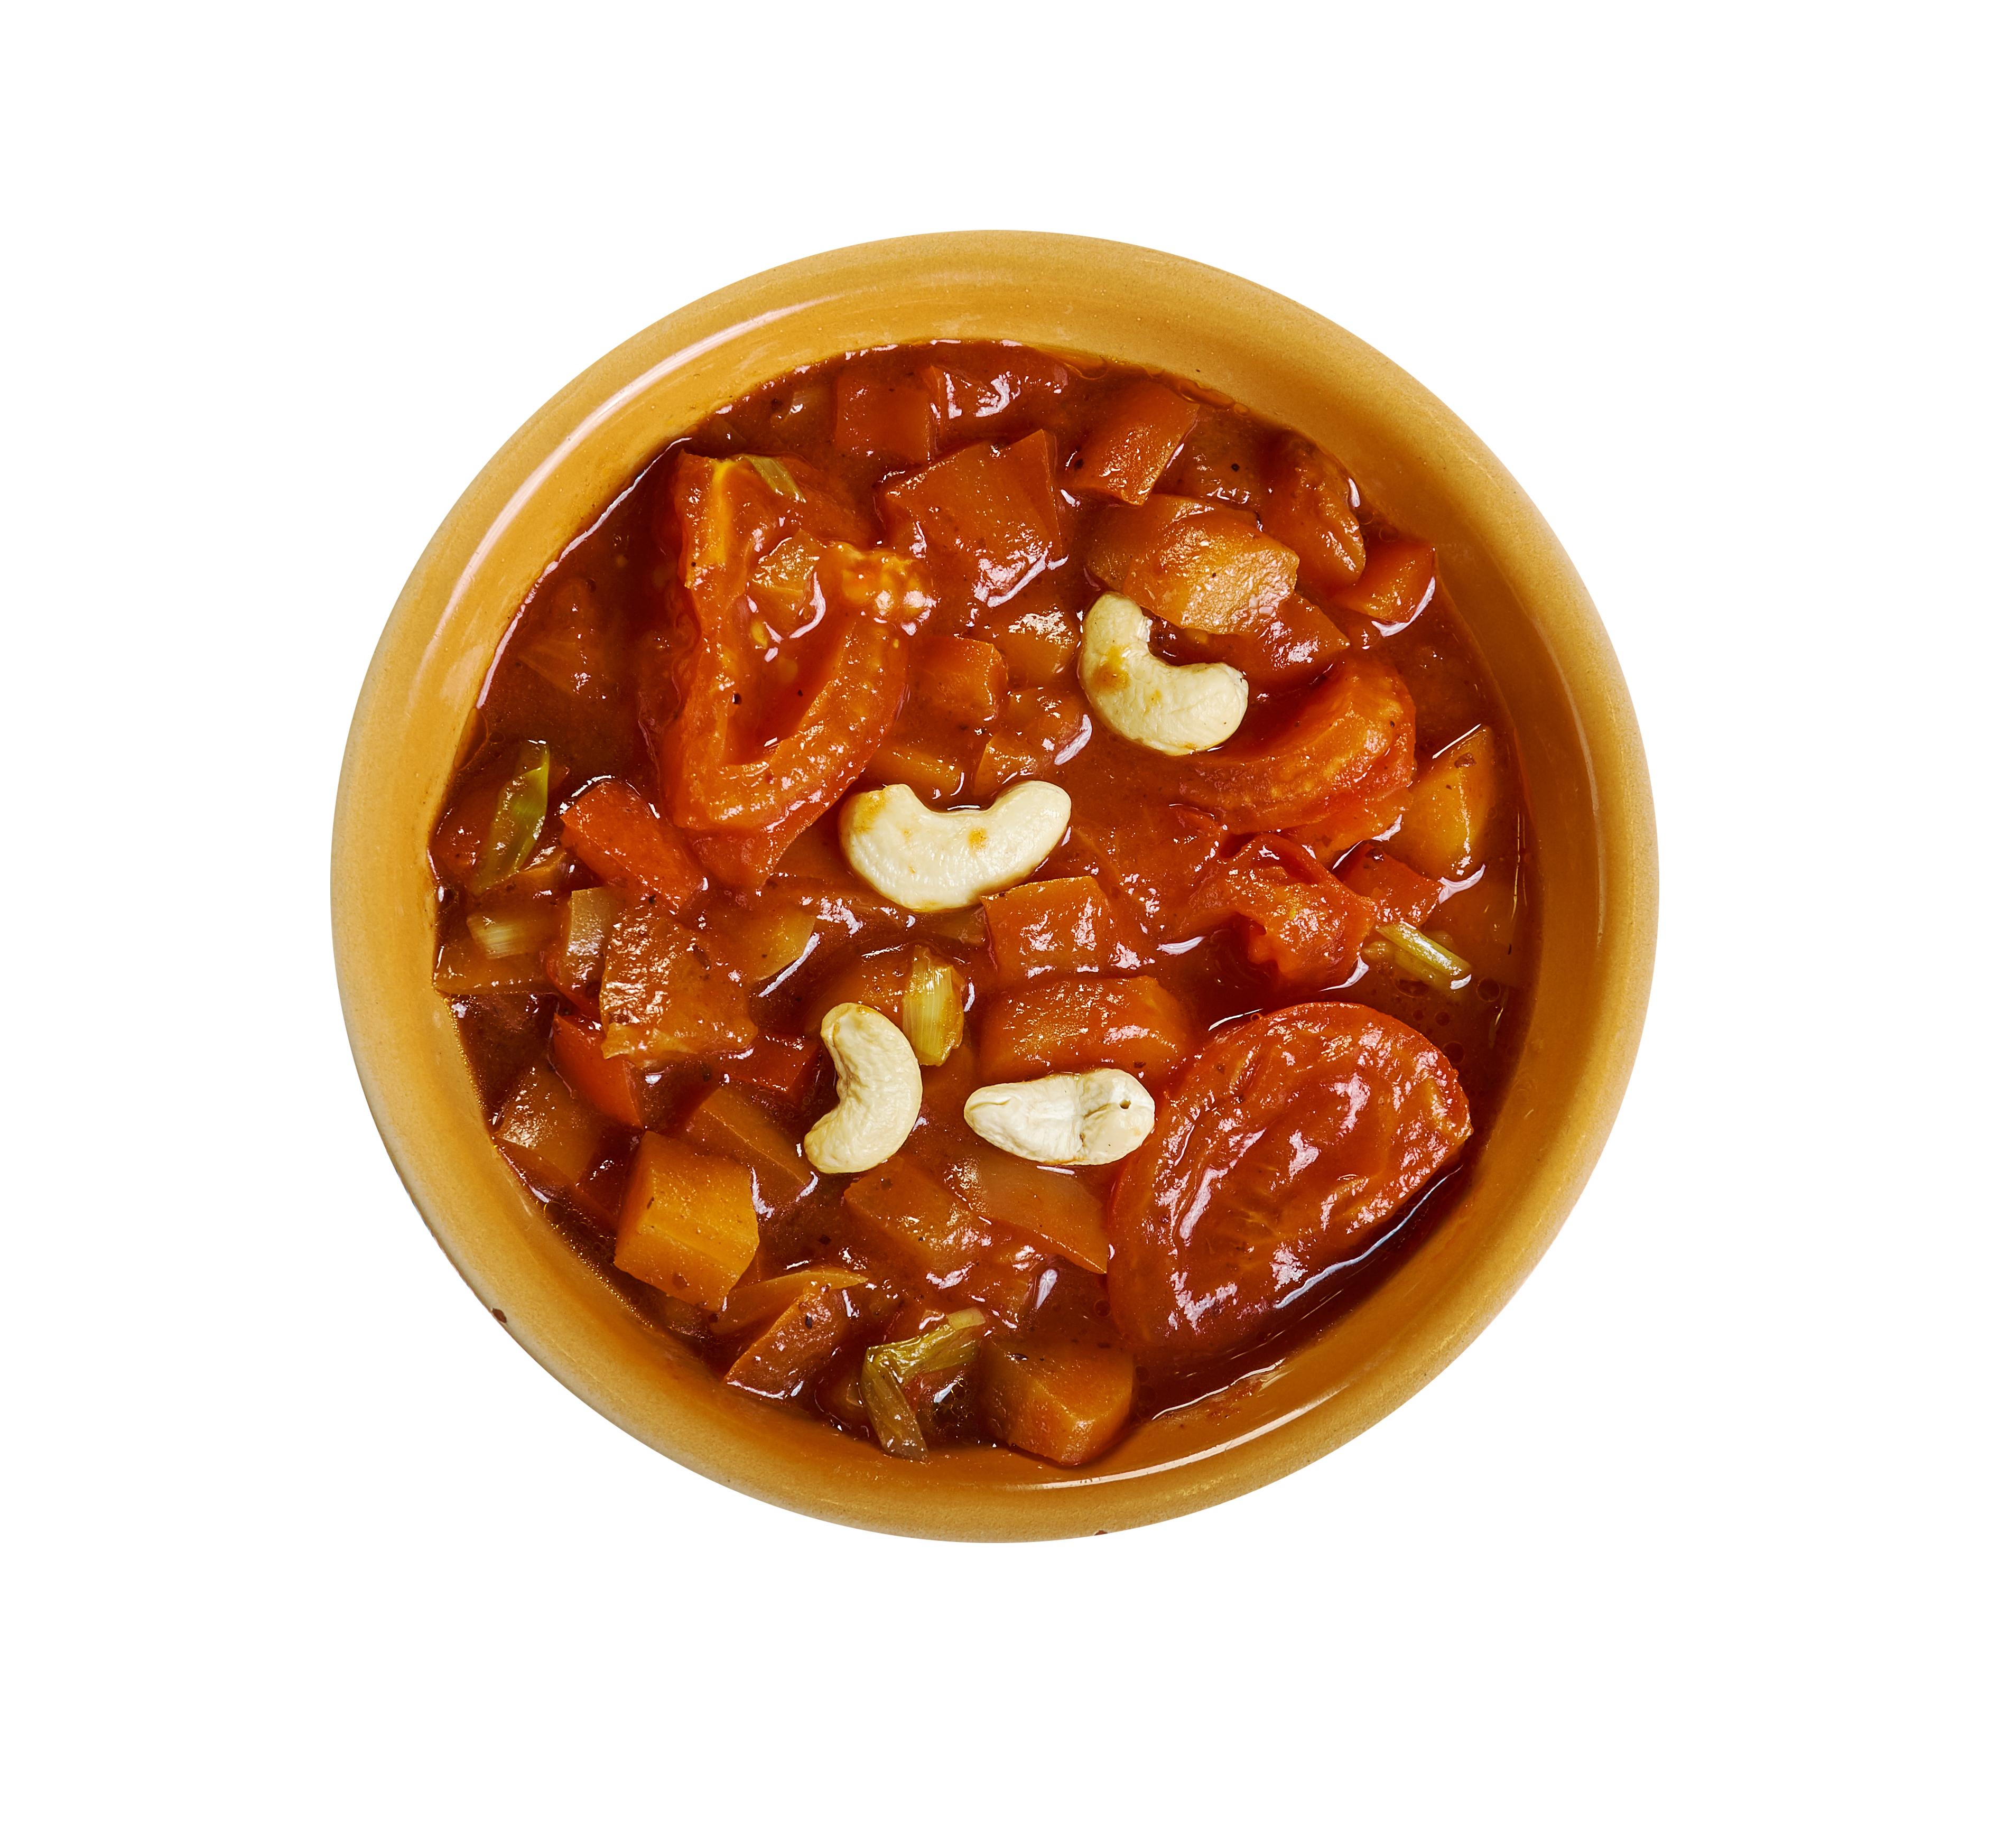 Matbucha garnished with cashew nuts